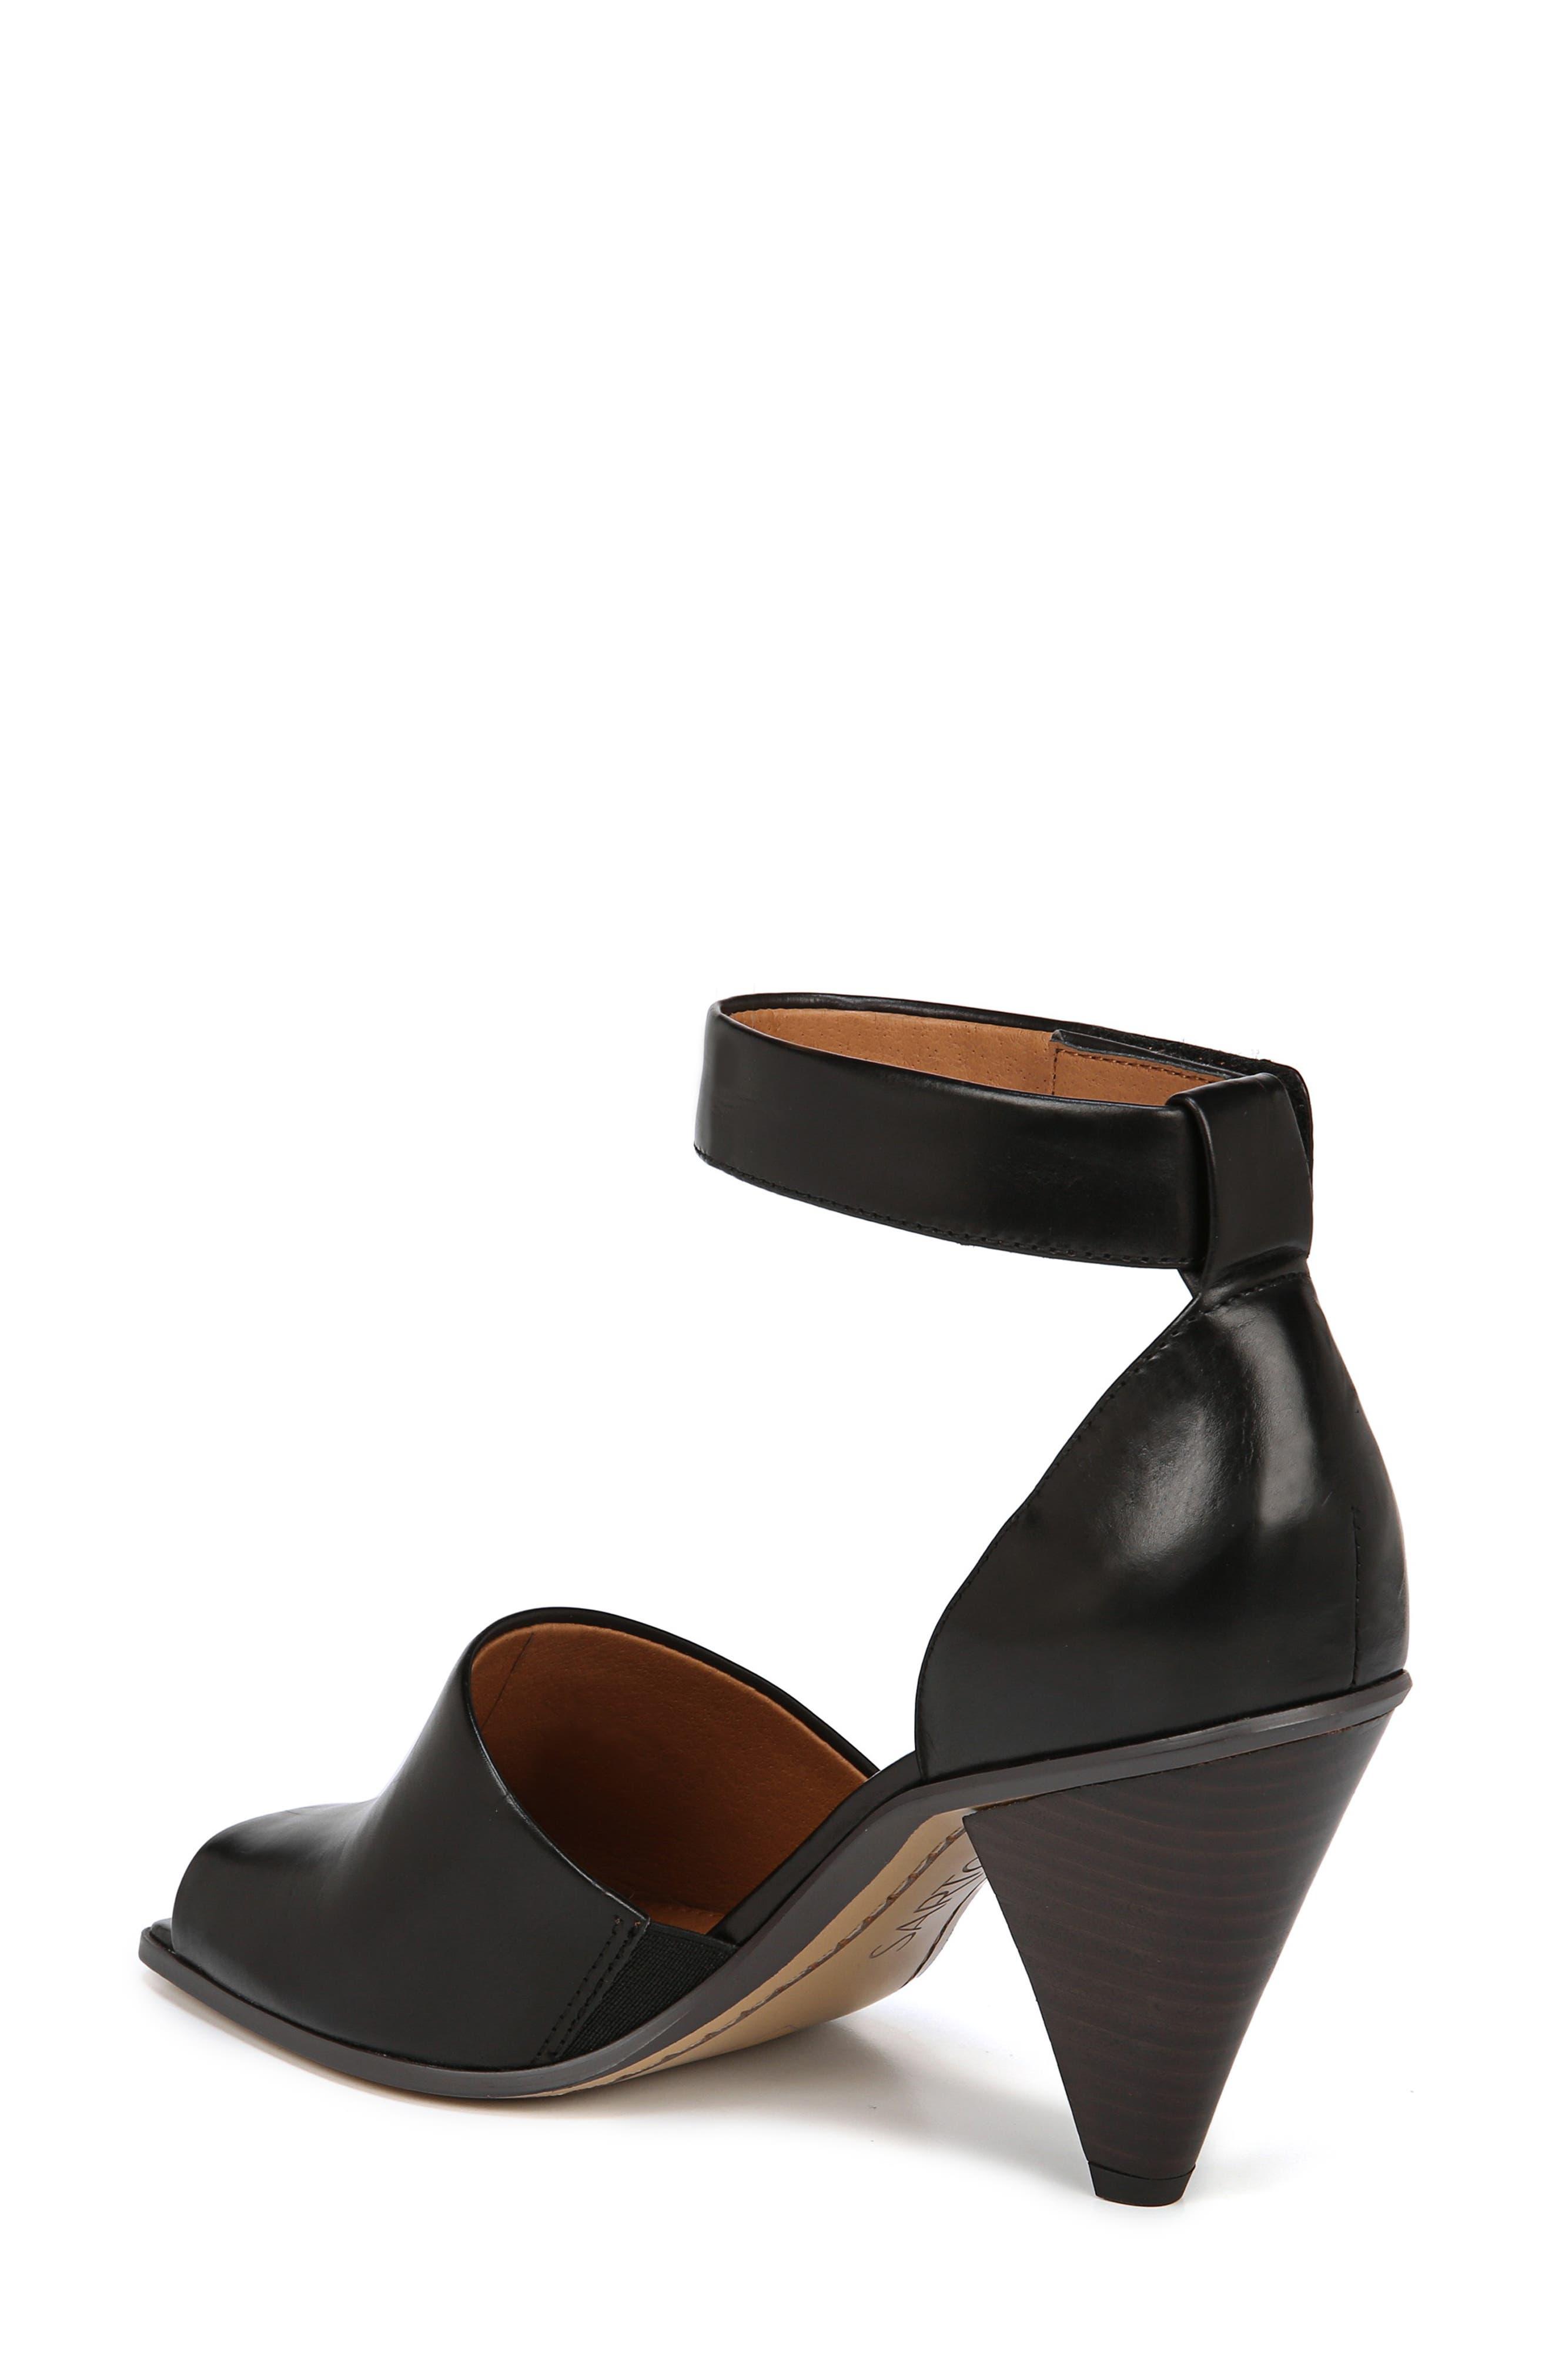 SARTO BY FRANCO SARTO, Ankle Strap Sandal, Alternate thumbnail 2, color, BLACK FOULARD LEATHER